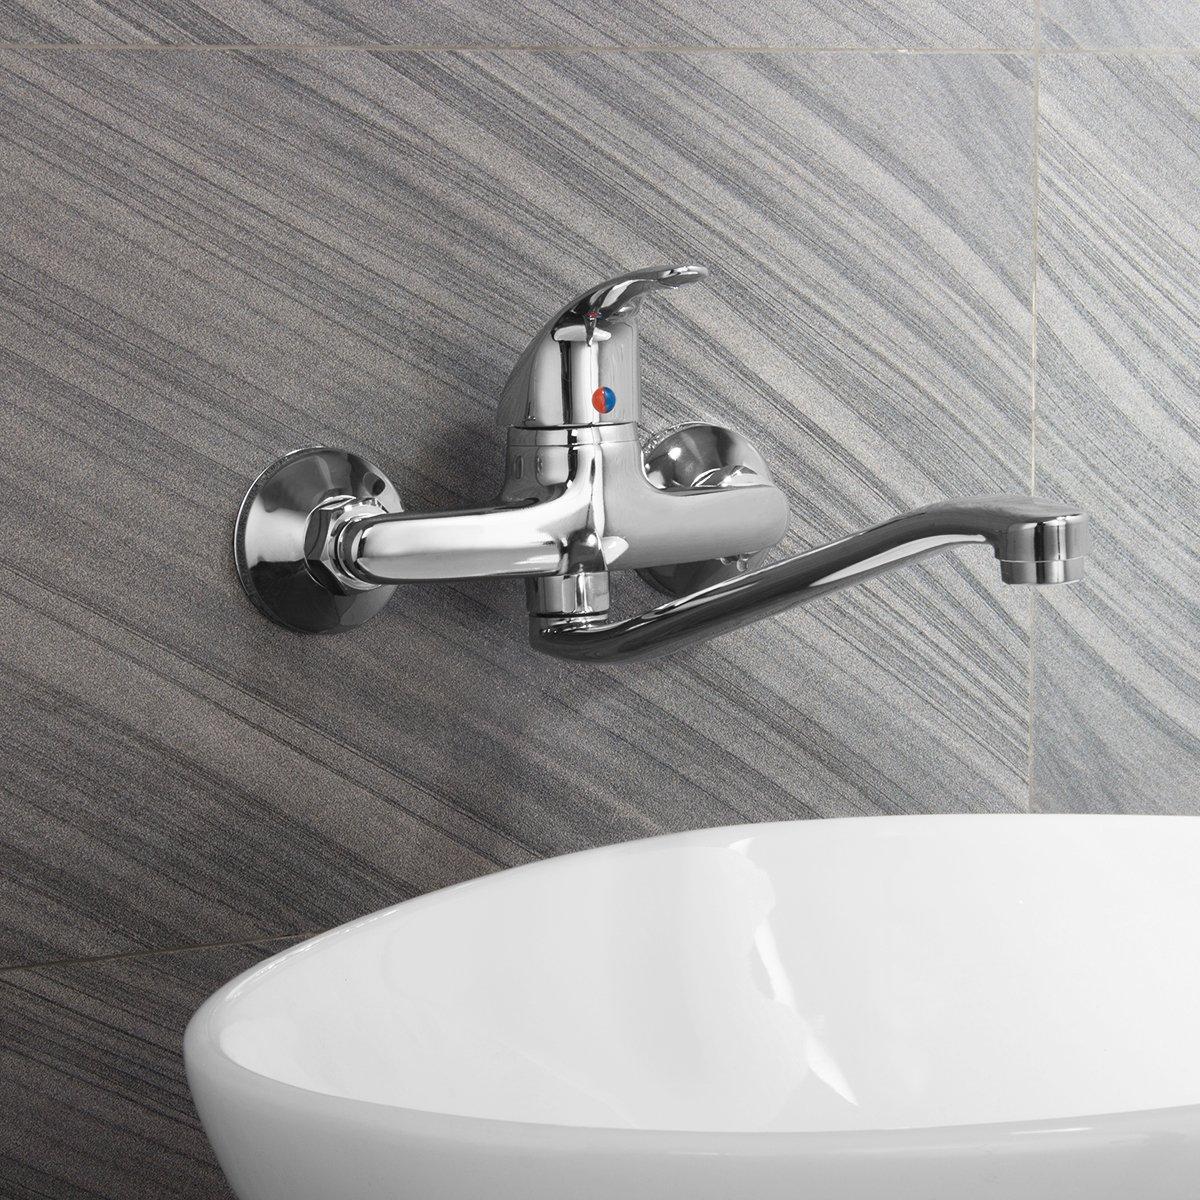 QOJA zinc alloy bathroom bathtub mixer tap single handle hot & by QOJA